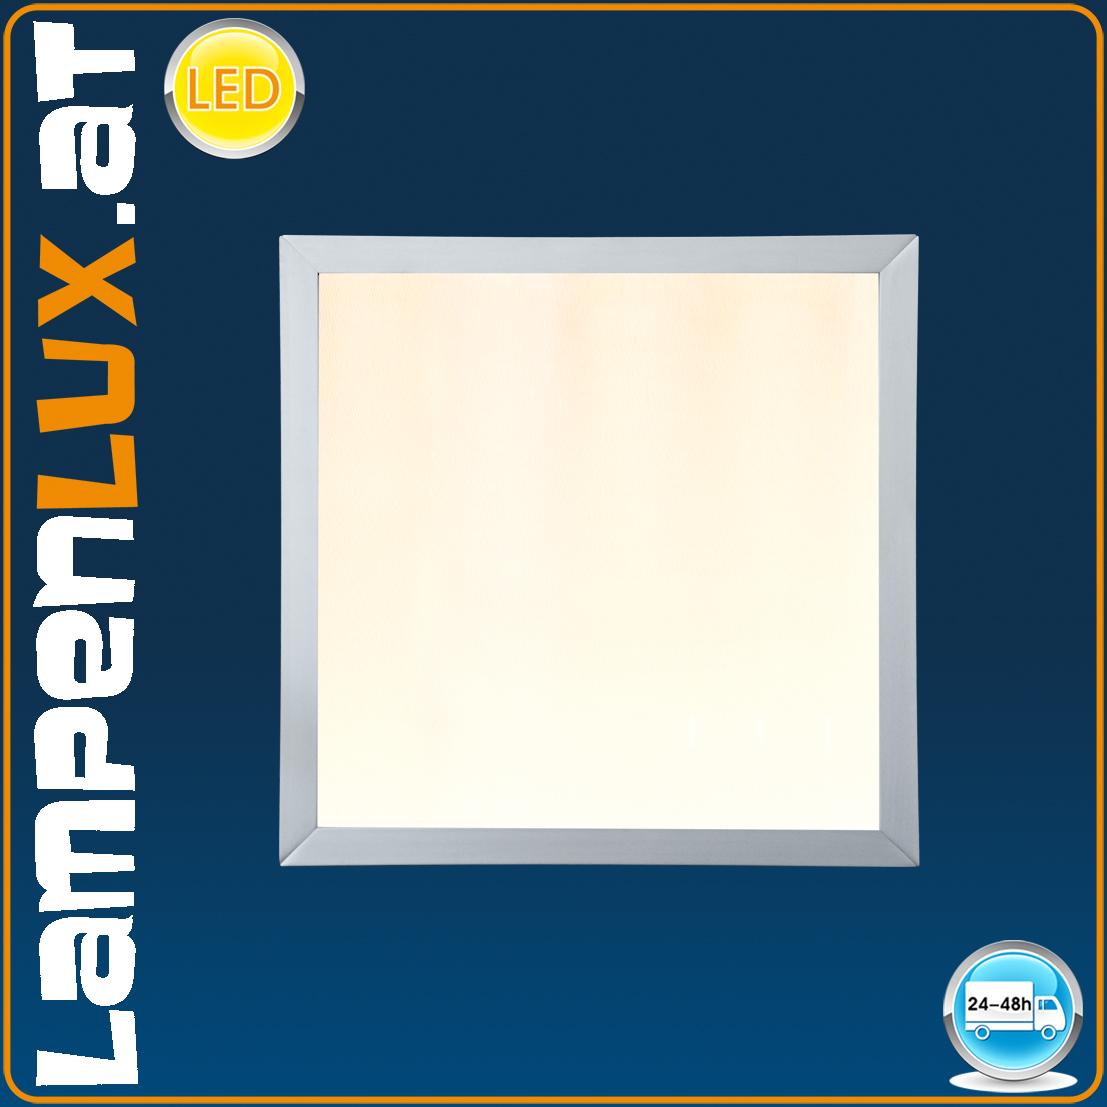 led panel paneel flach aufbau wand decken leuchte lampe 150 300 600 620 1200 mm ebay. Black Bedroom Furniture Sets. Home Design Ideas